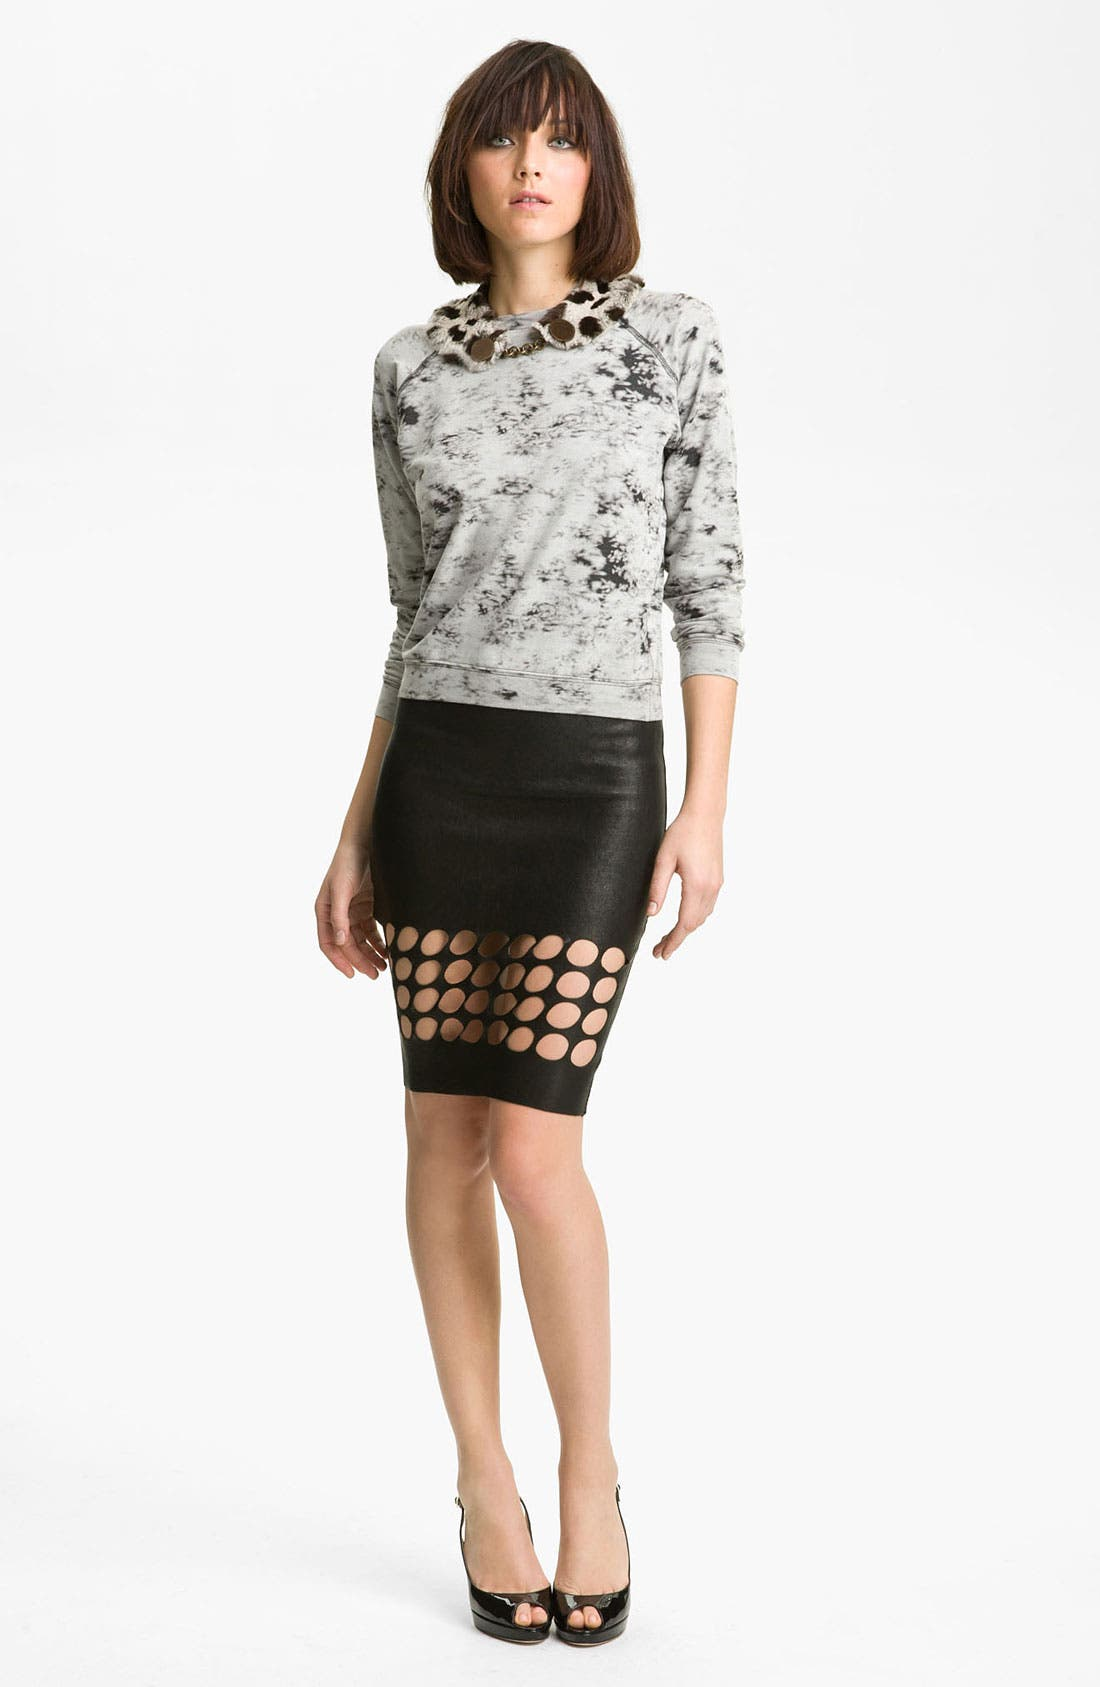 Main Image - Kelly Wearstler 'Priscilla' Sweatshirt with Removable Rabbit Fur Collar